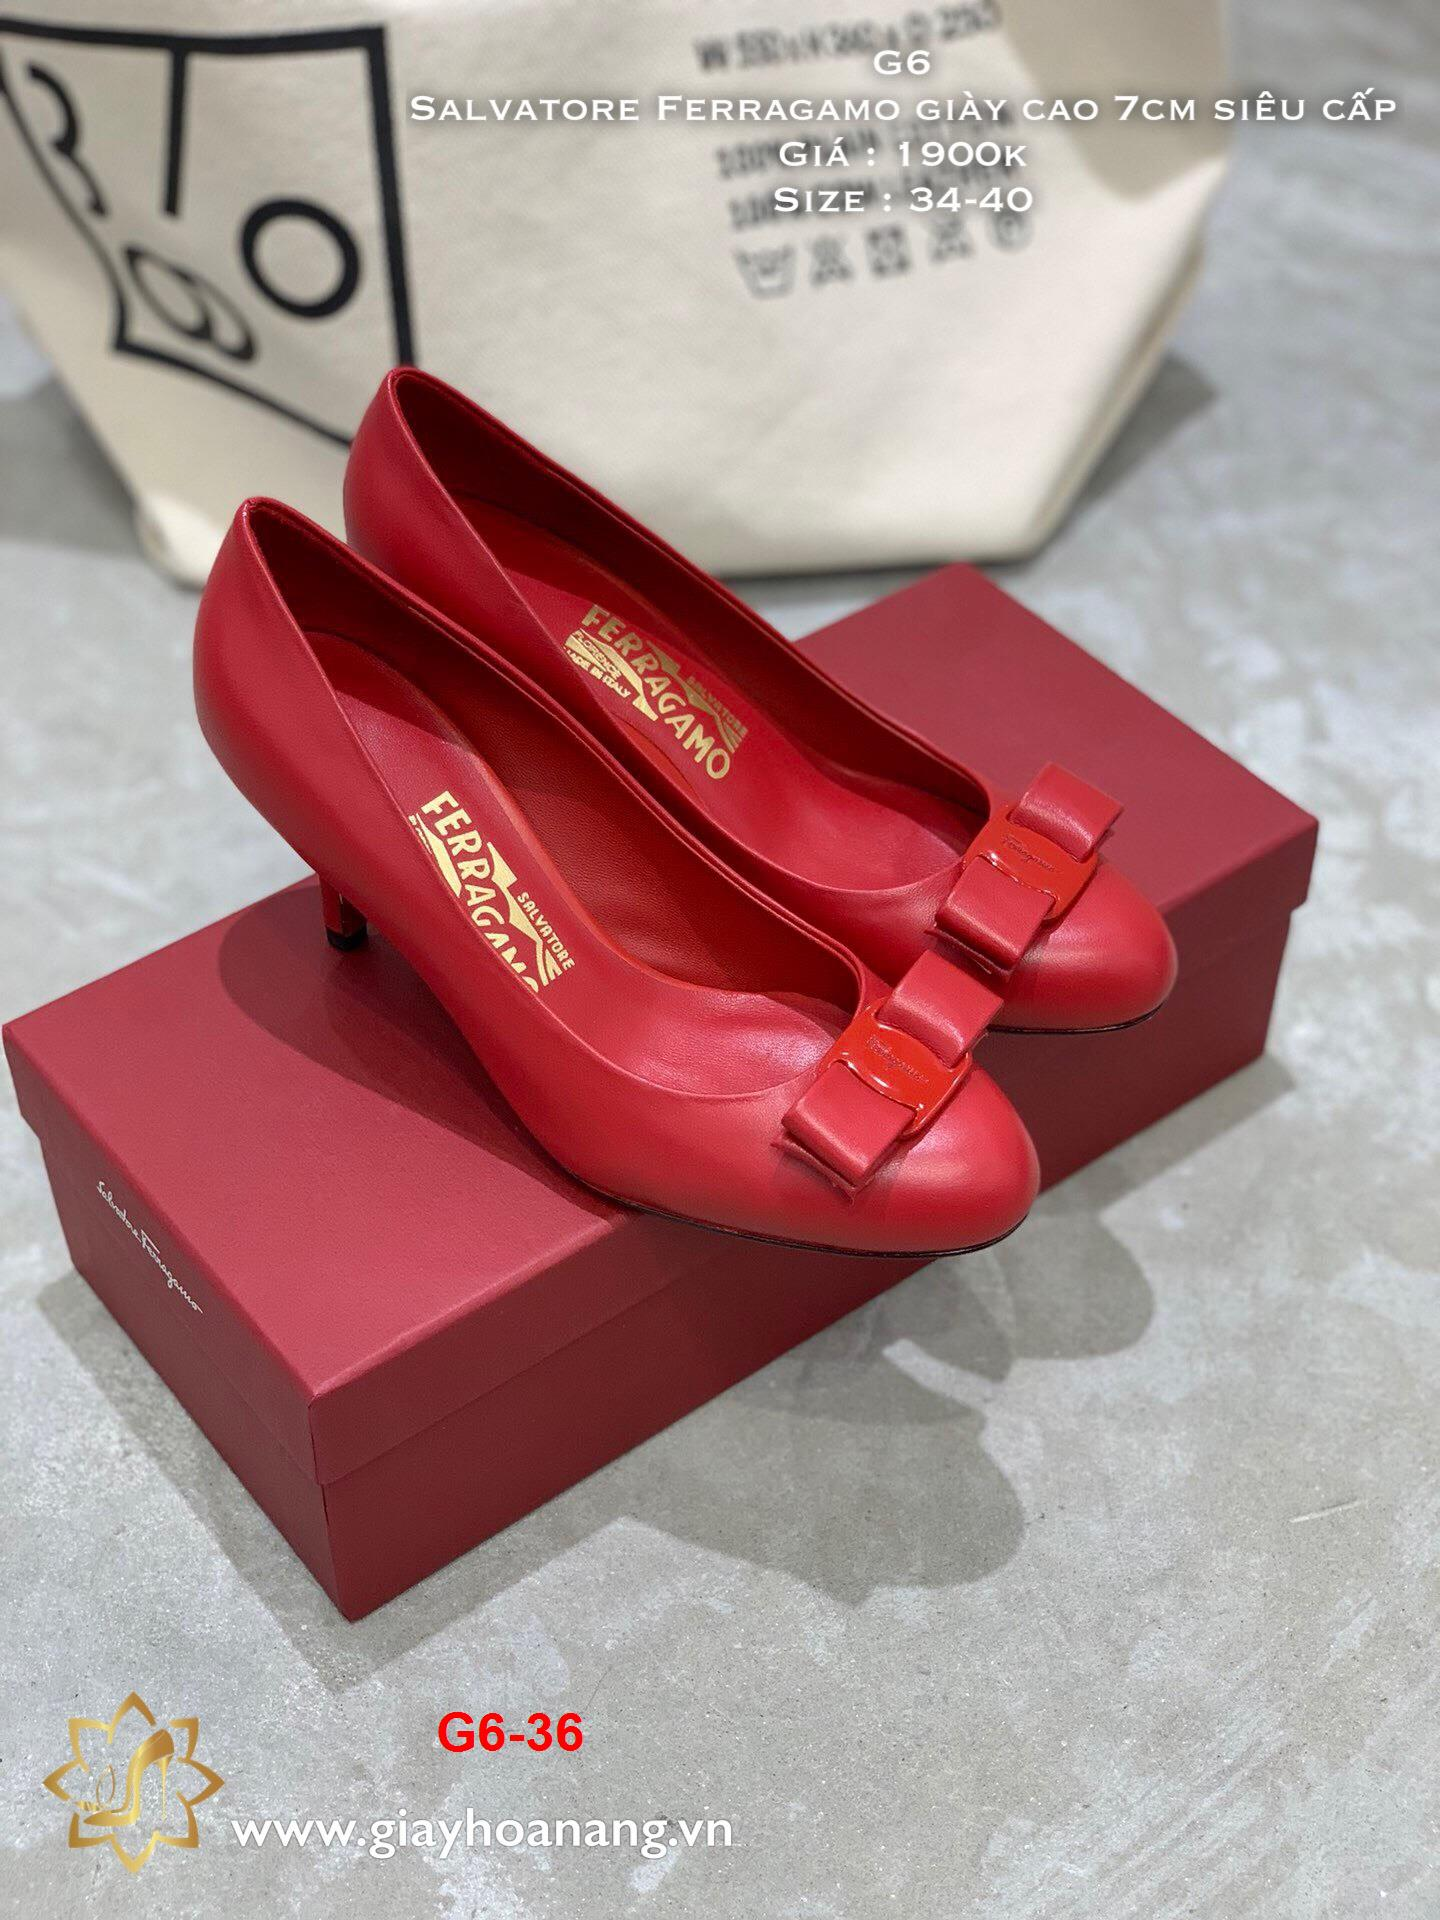 G6-36 Salvatore Ferragamo giày cao 7cm siêu cấp